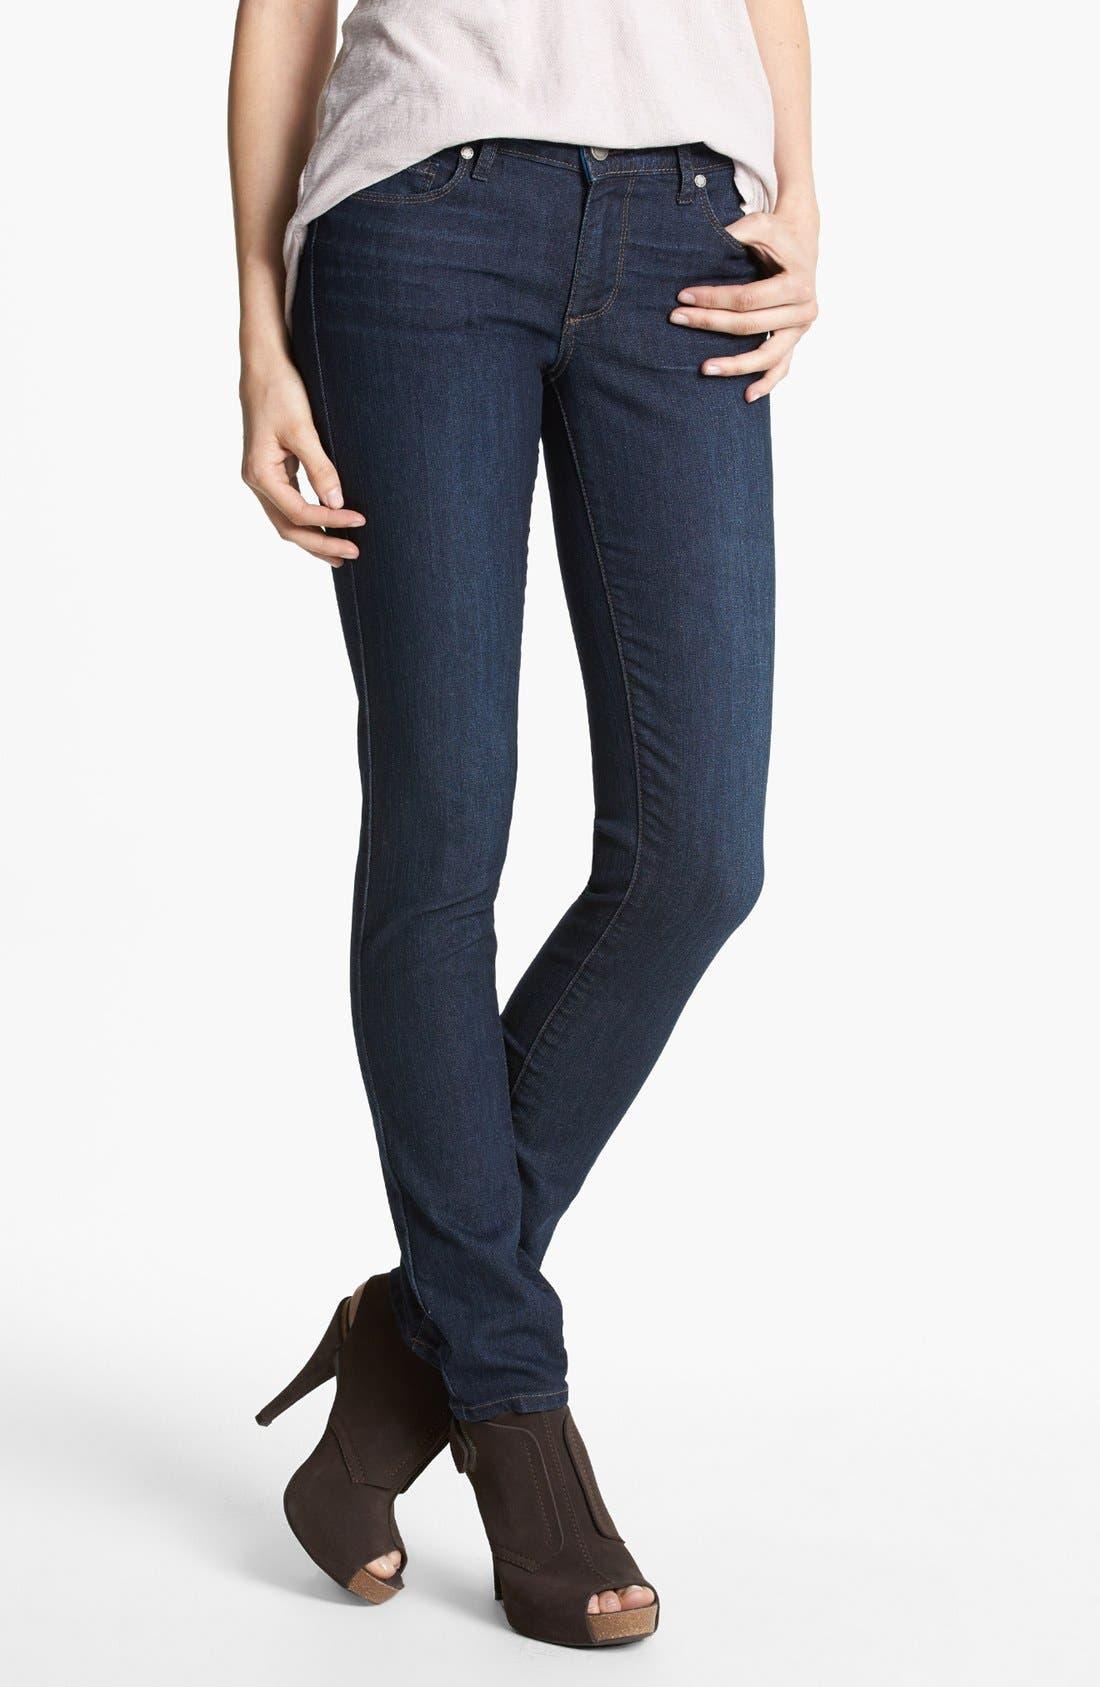 Alternate Image 1 Selected - Paige Denim 'Skyline' Skinny Jeans (Jenna)